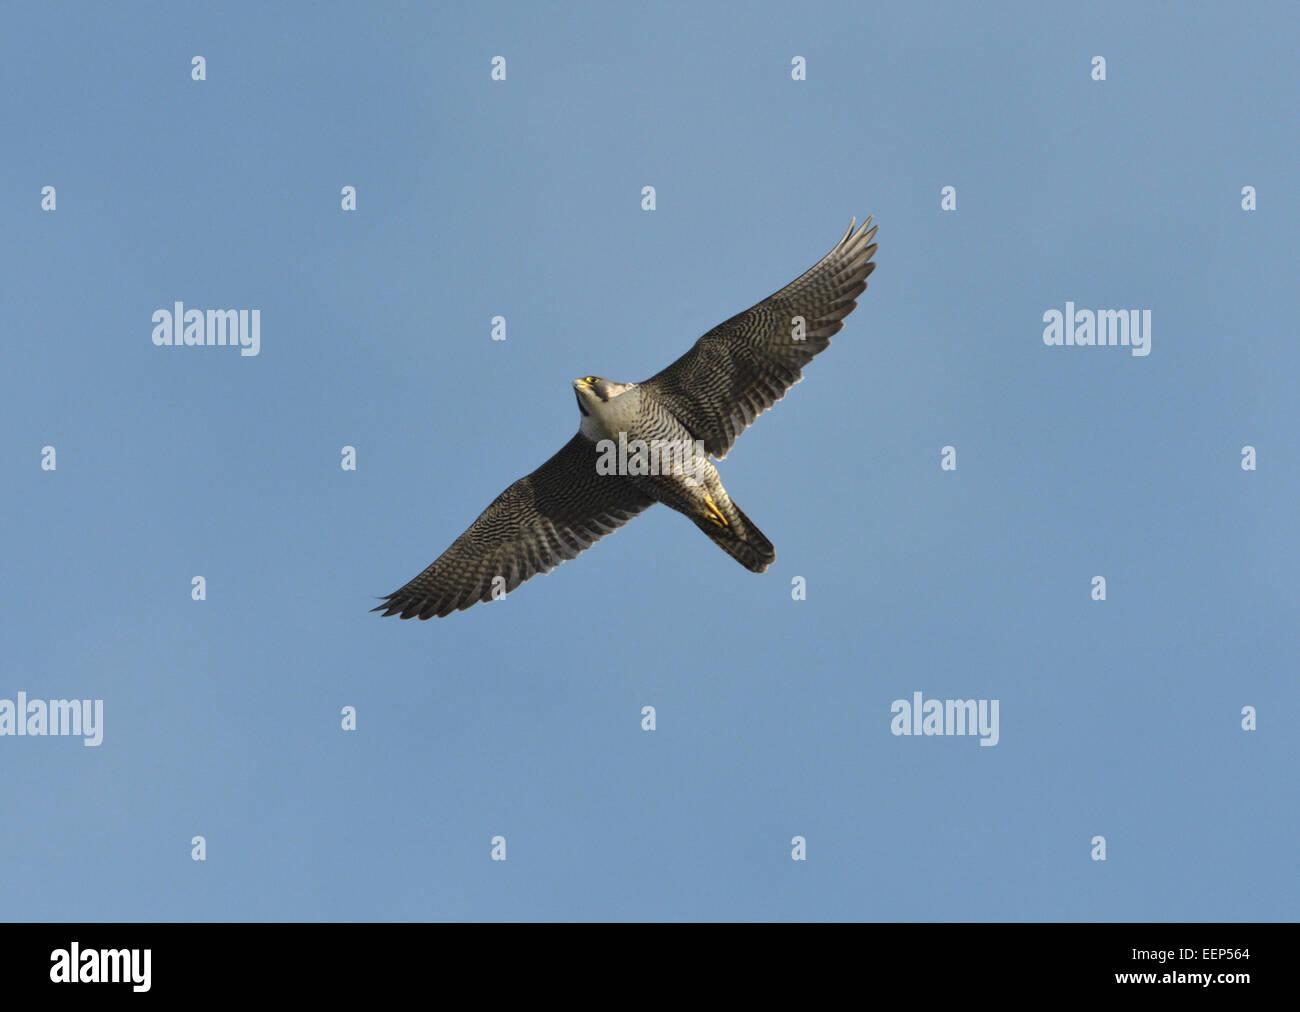 Pellegrino - Falco peregrinus Foto Stock